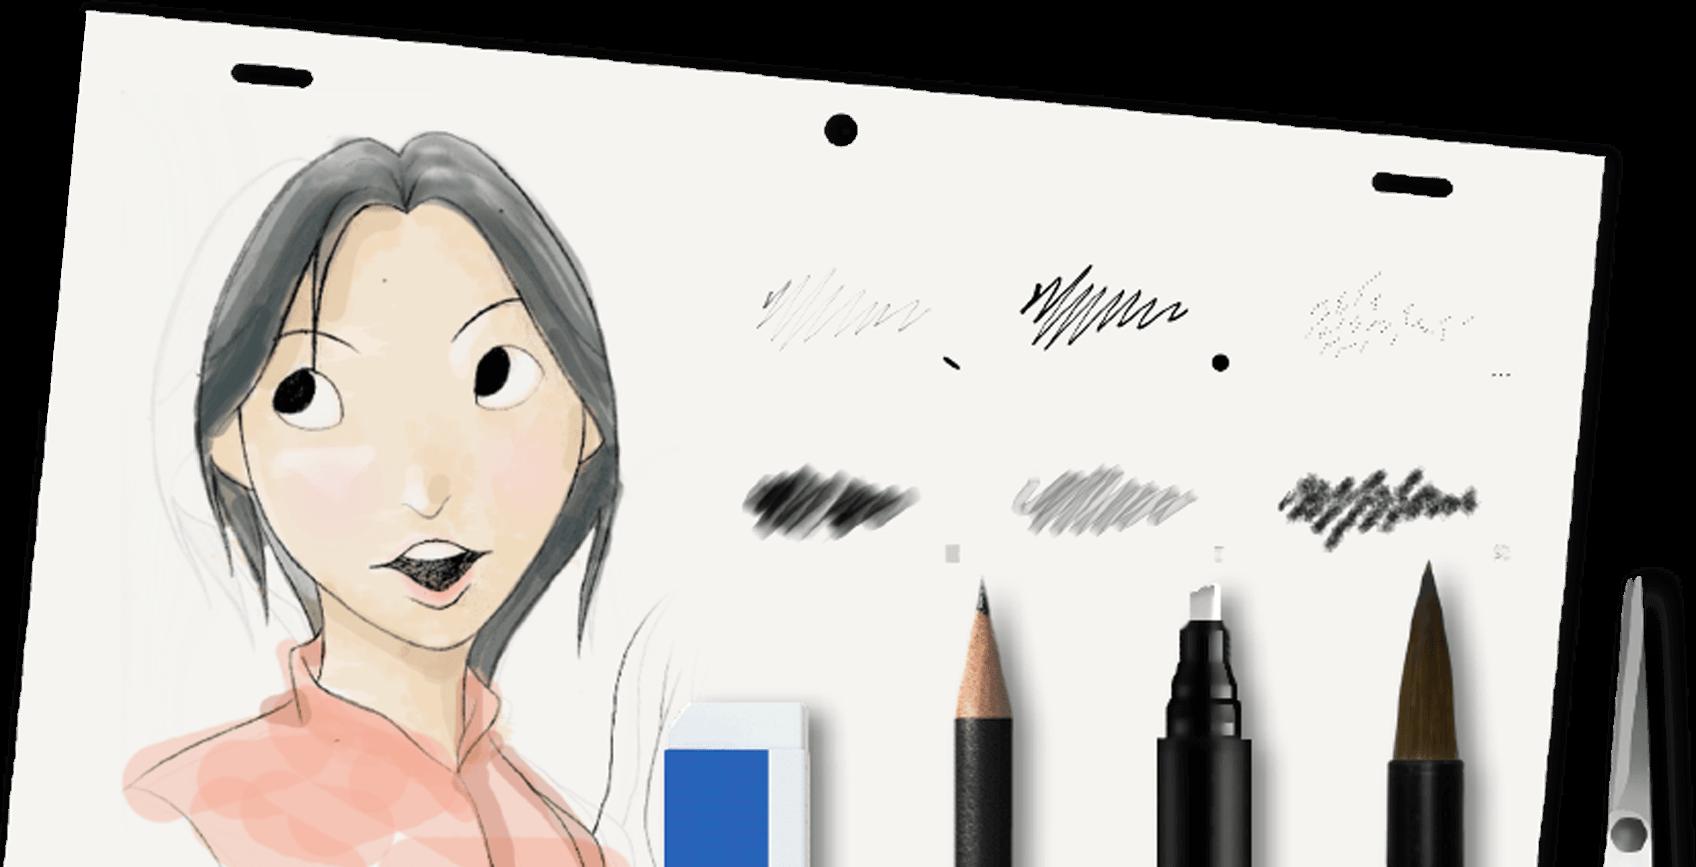 403 Forbidden Cool Animations Animation App